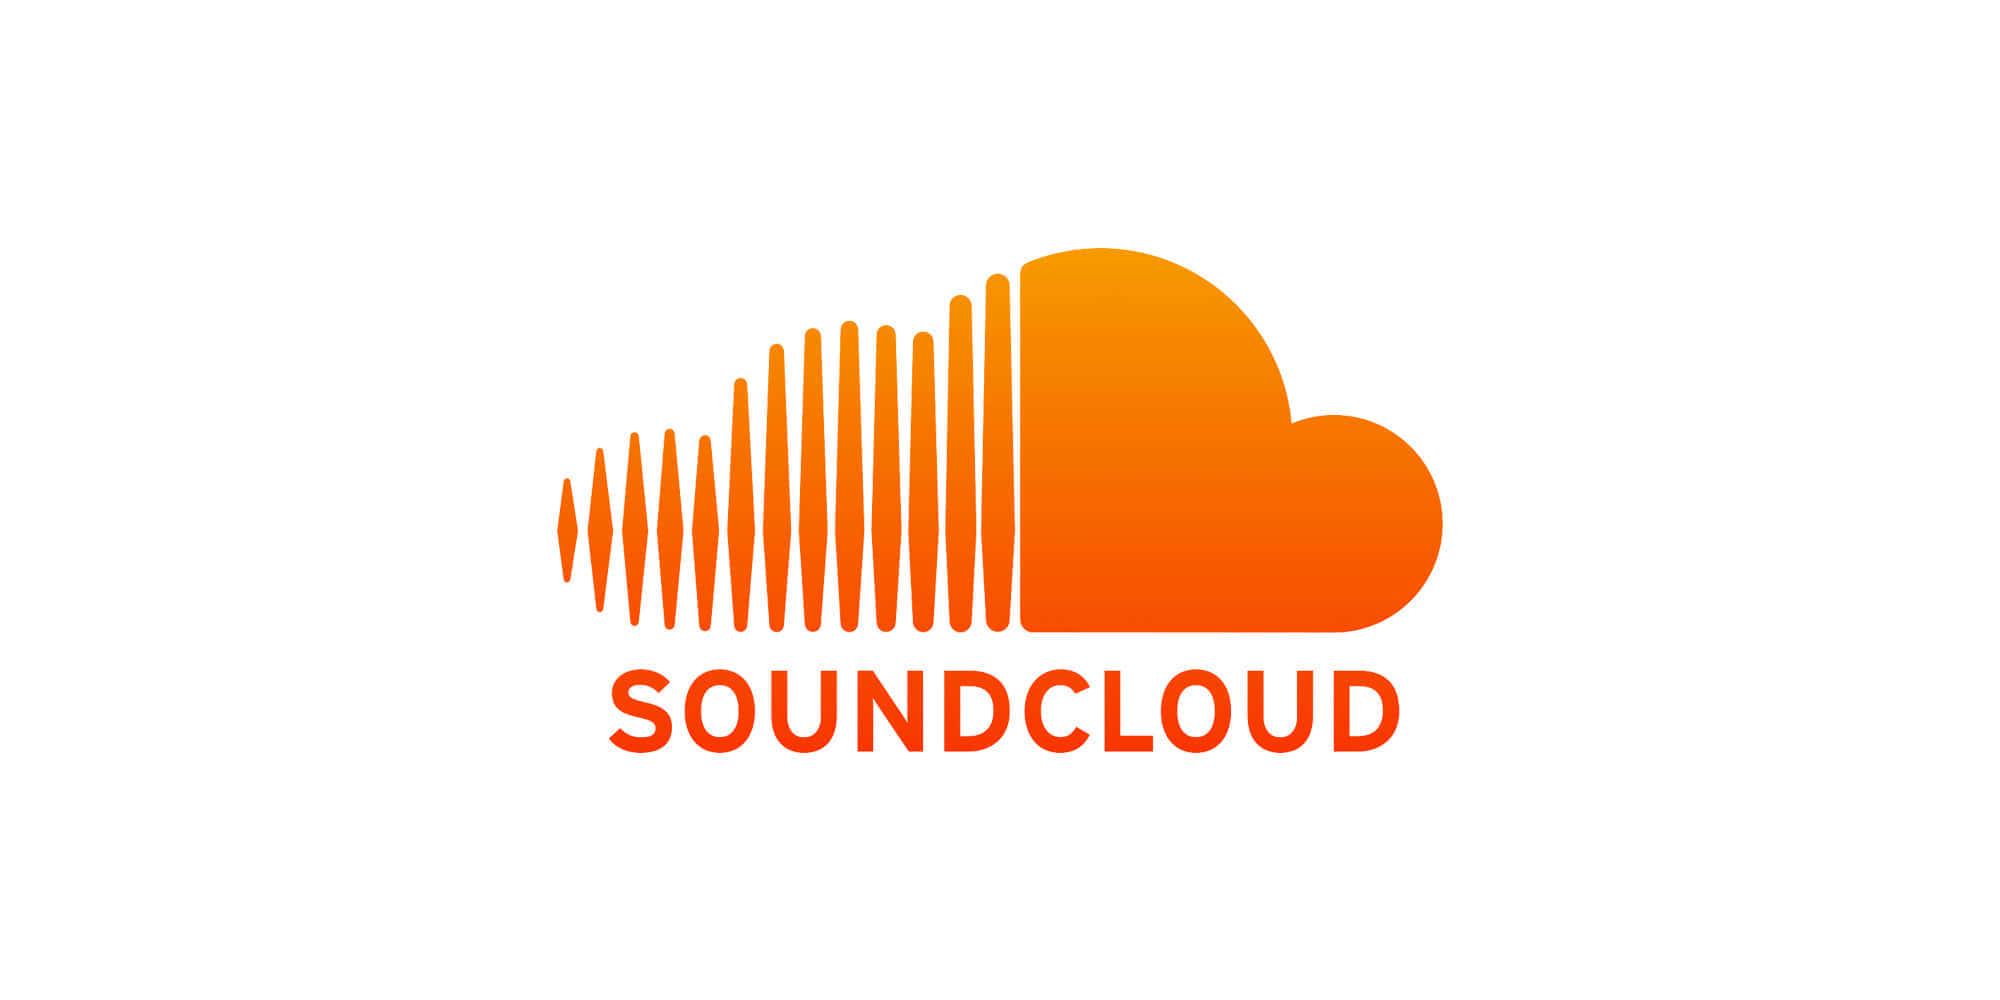 Opus Dei - 380 audios en el canal de Soundcloud